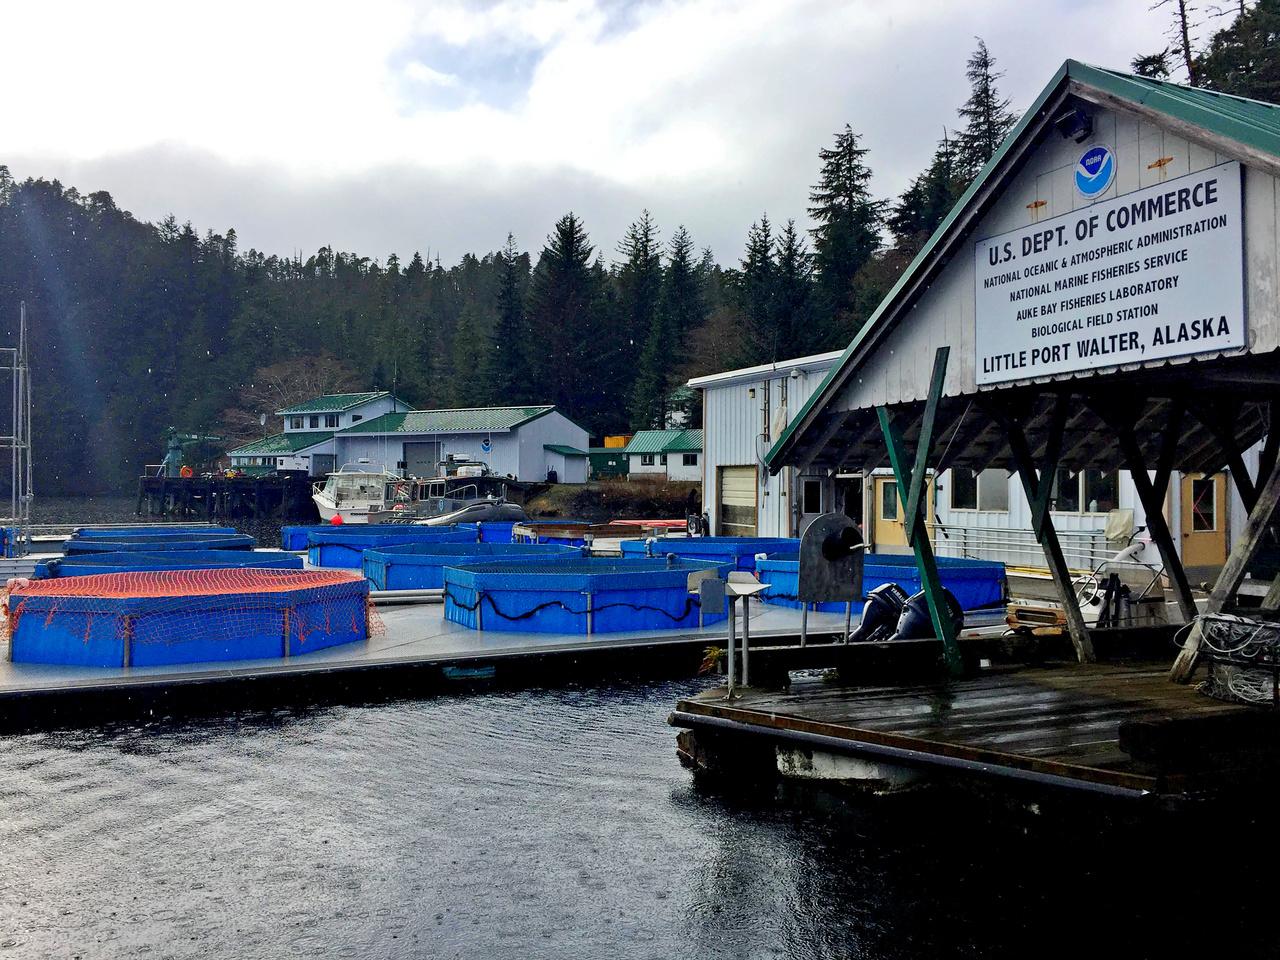 Little Port Walter Field Station, Alaska.